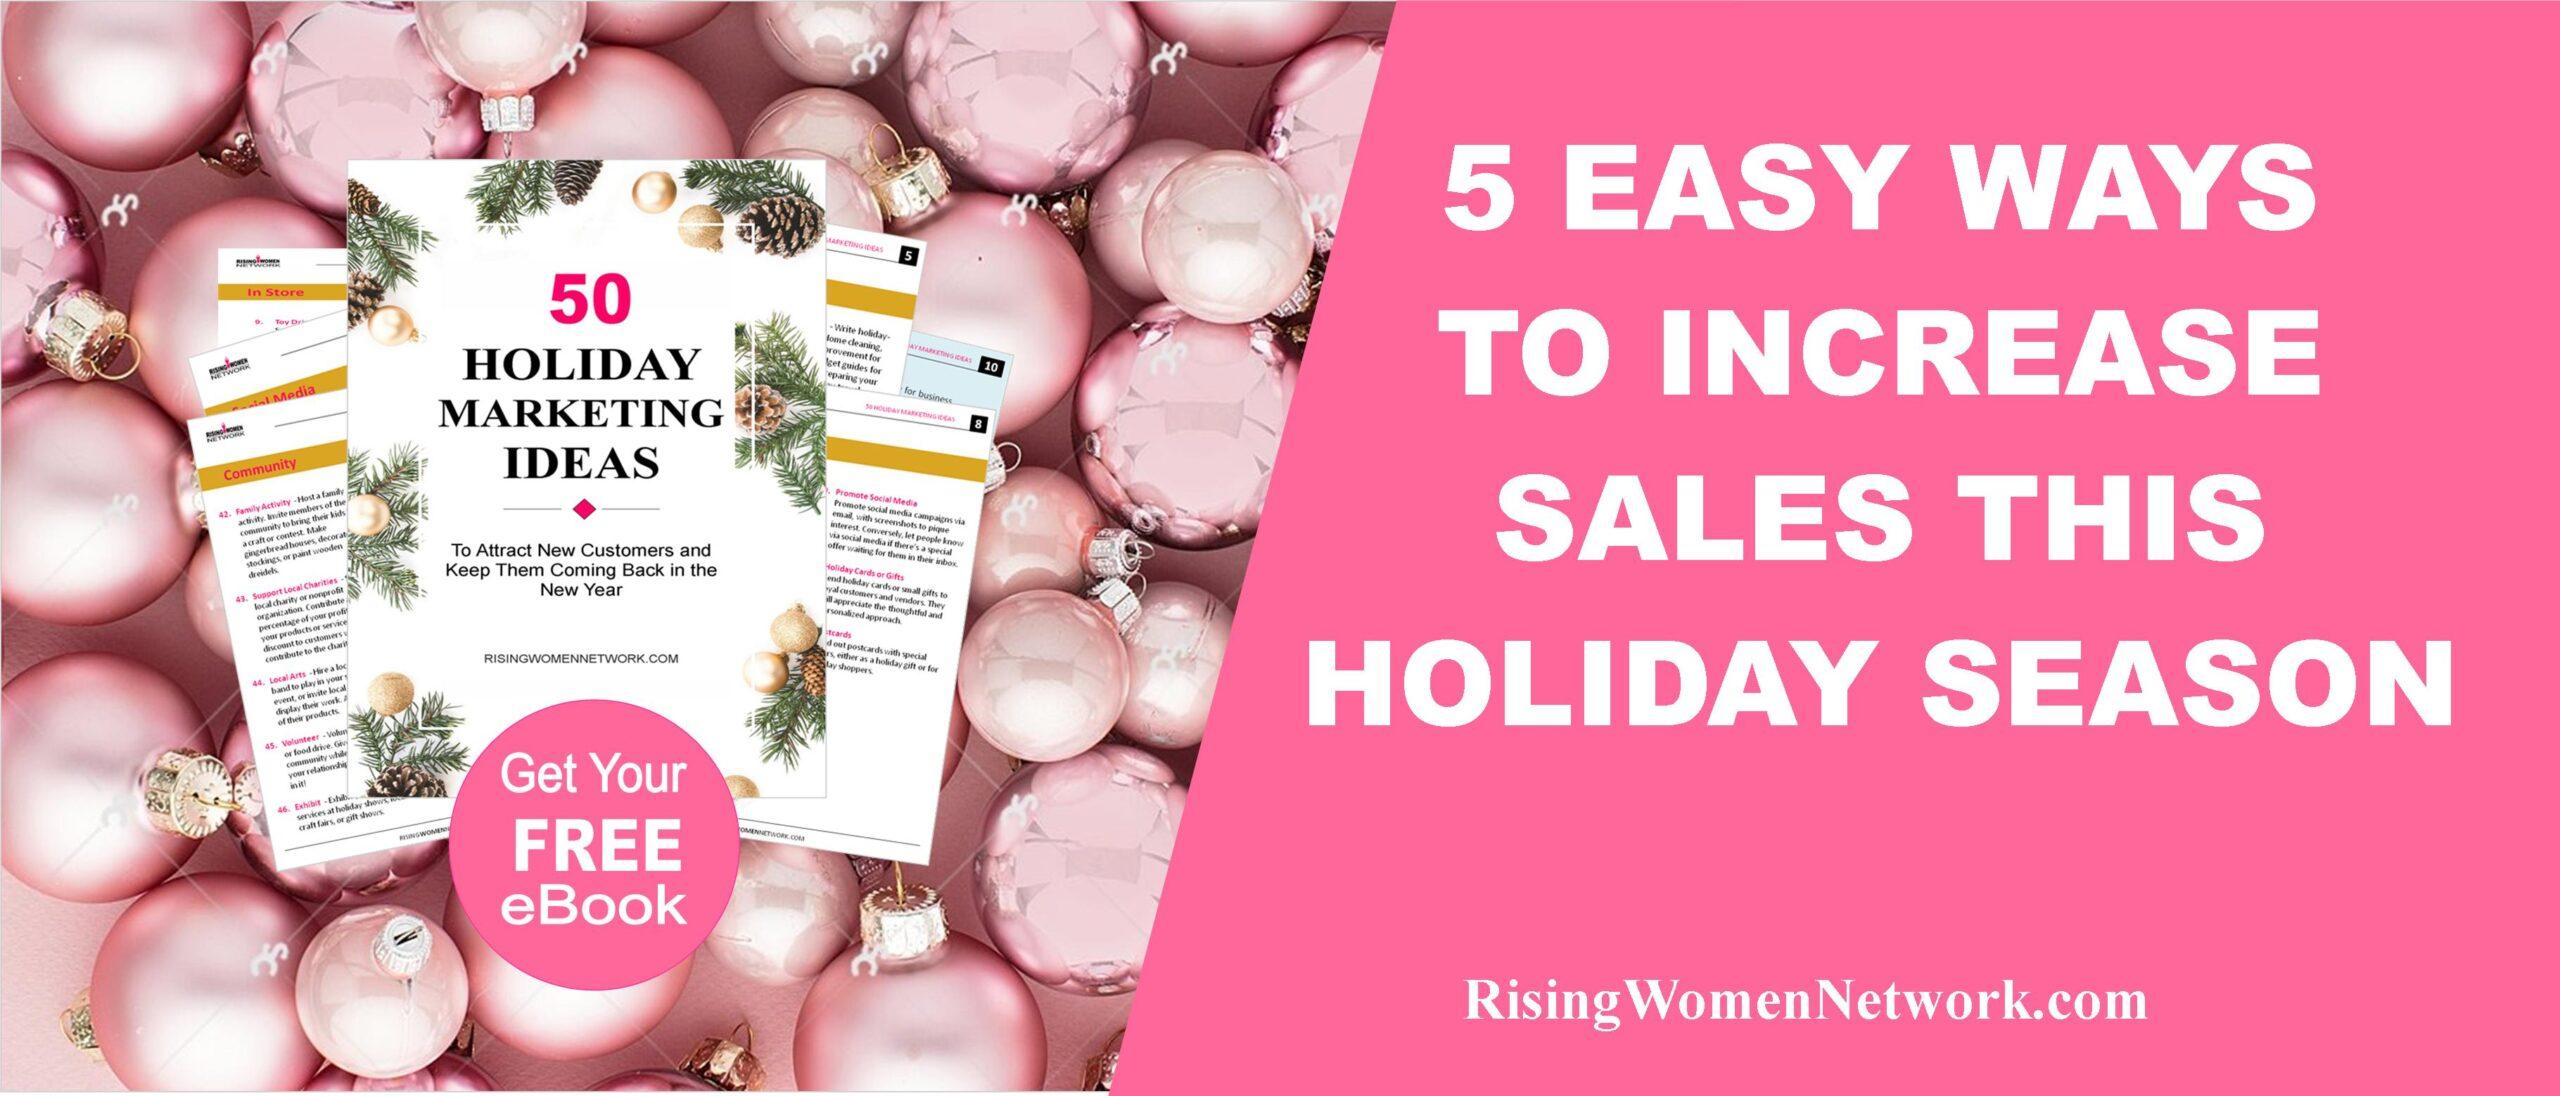 5 Easy Ways to Increase Sales This Holiday Season